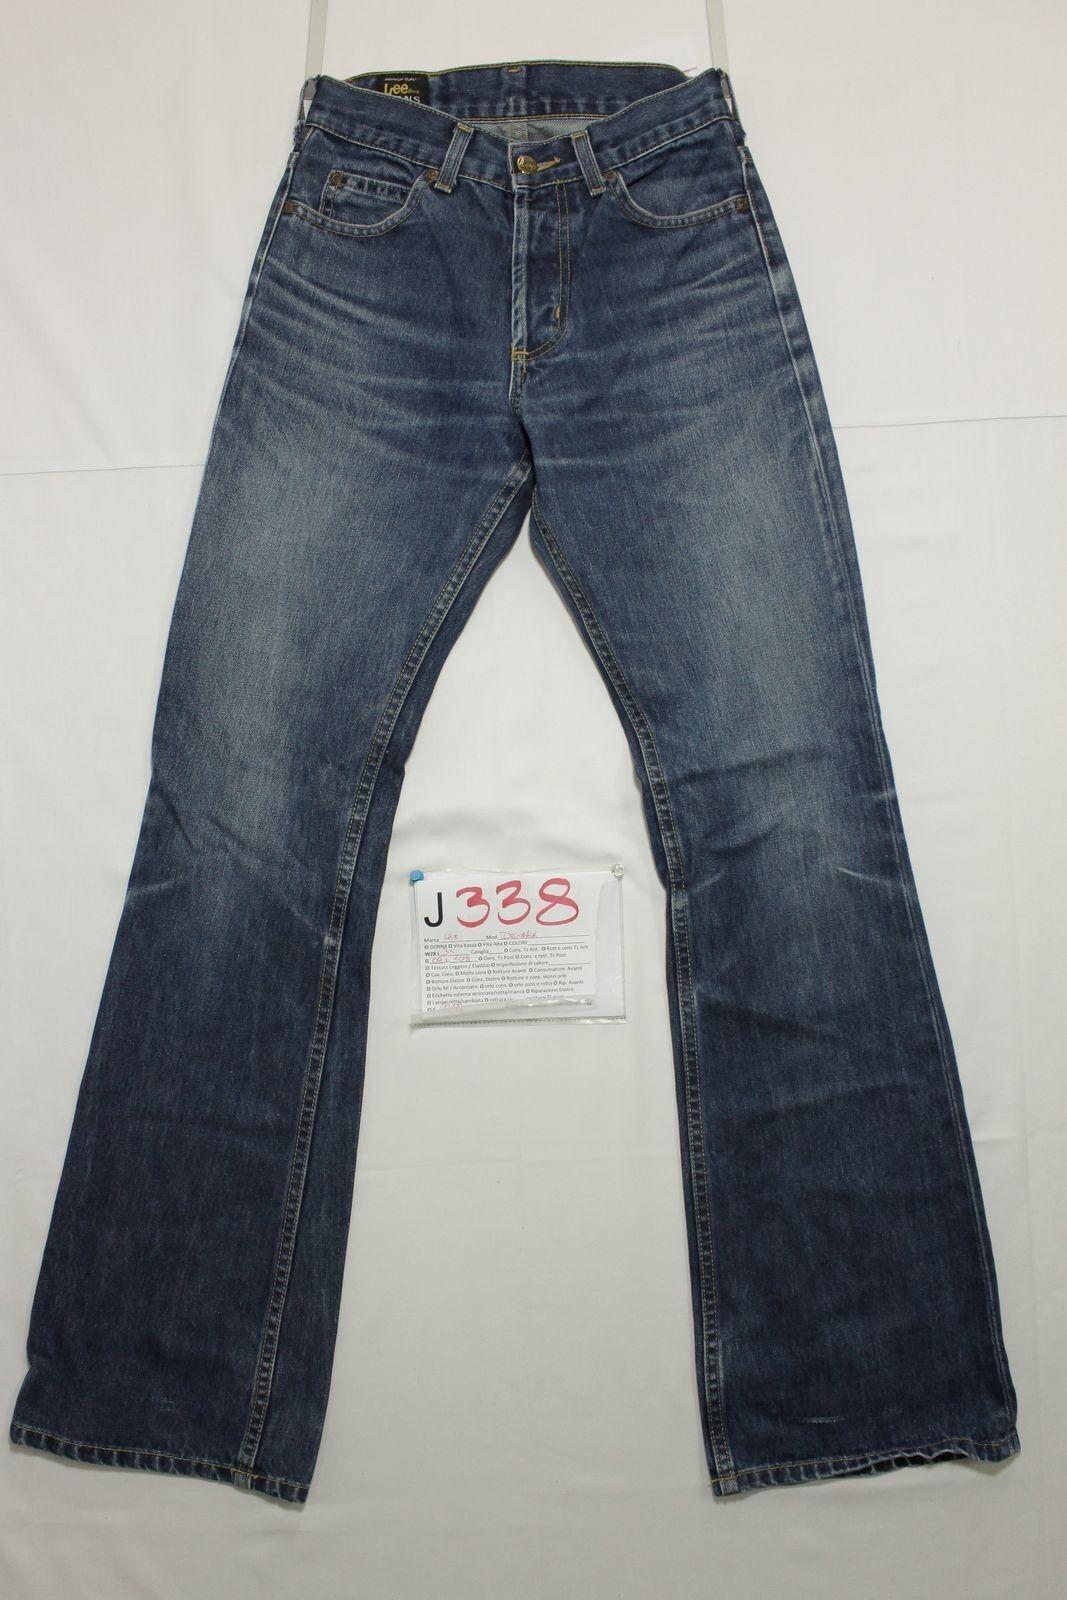 Lee denver (Cod.J338) Gr.42 W28 L34 jeans gebraucht Stiefelcut Pfote vintage